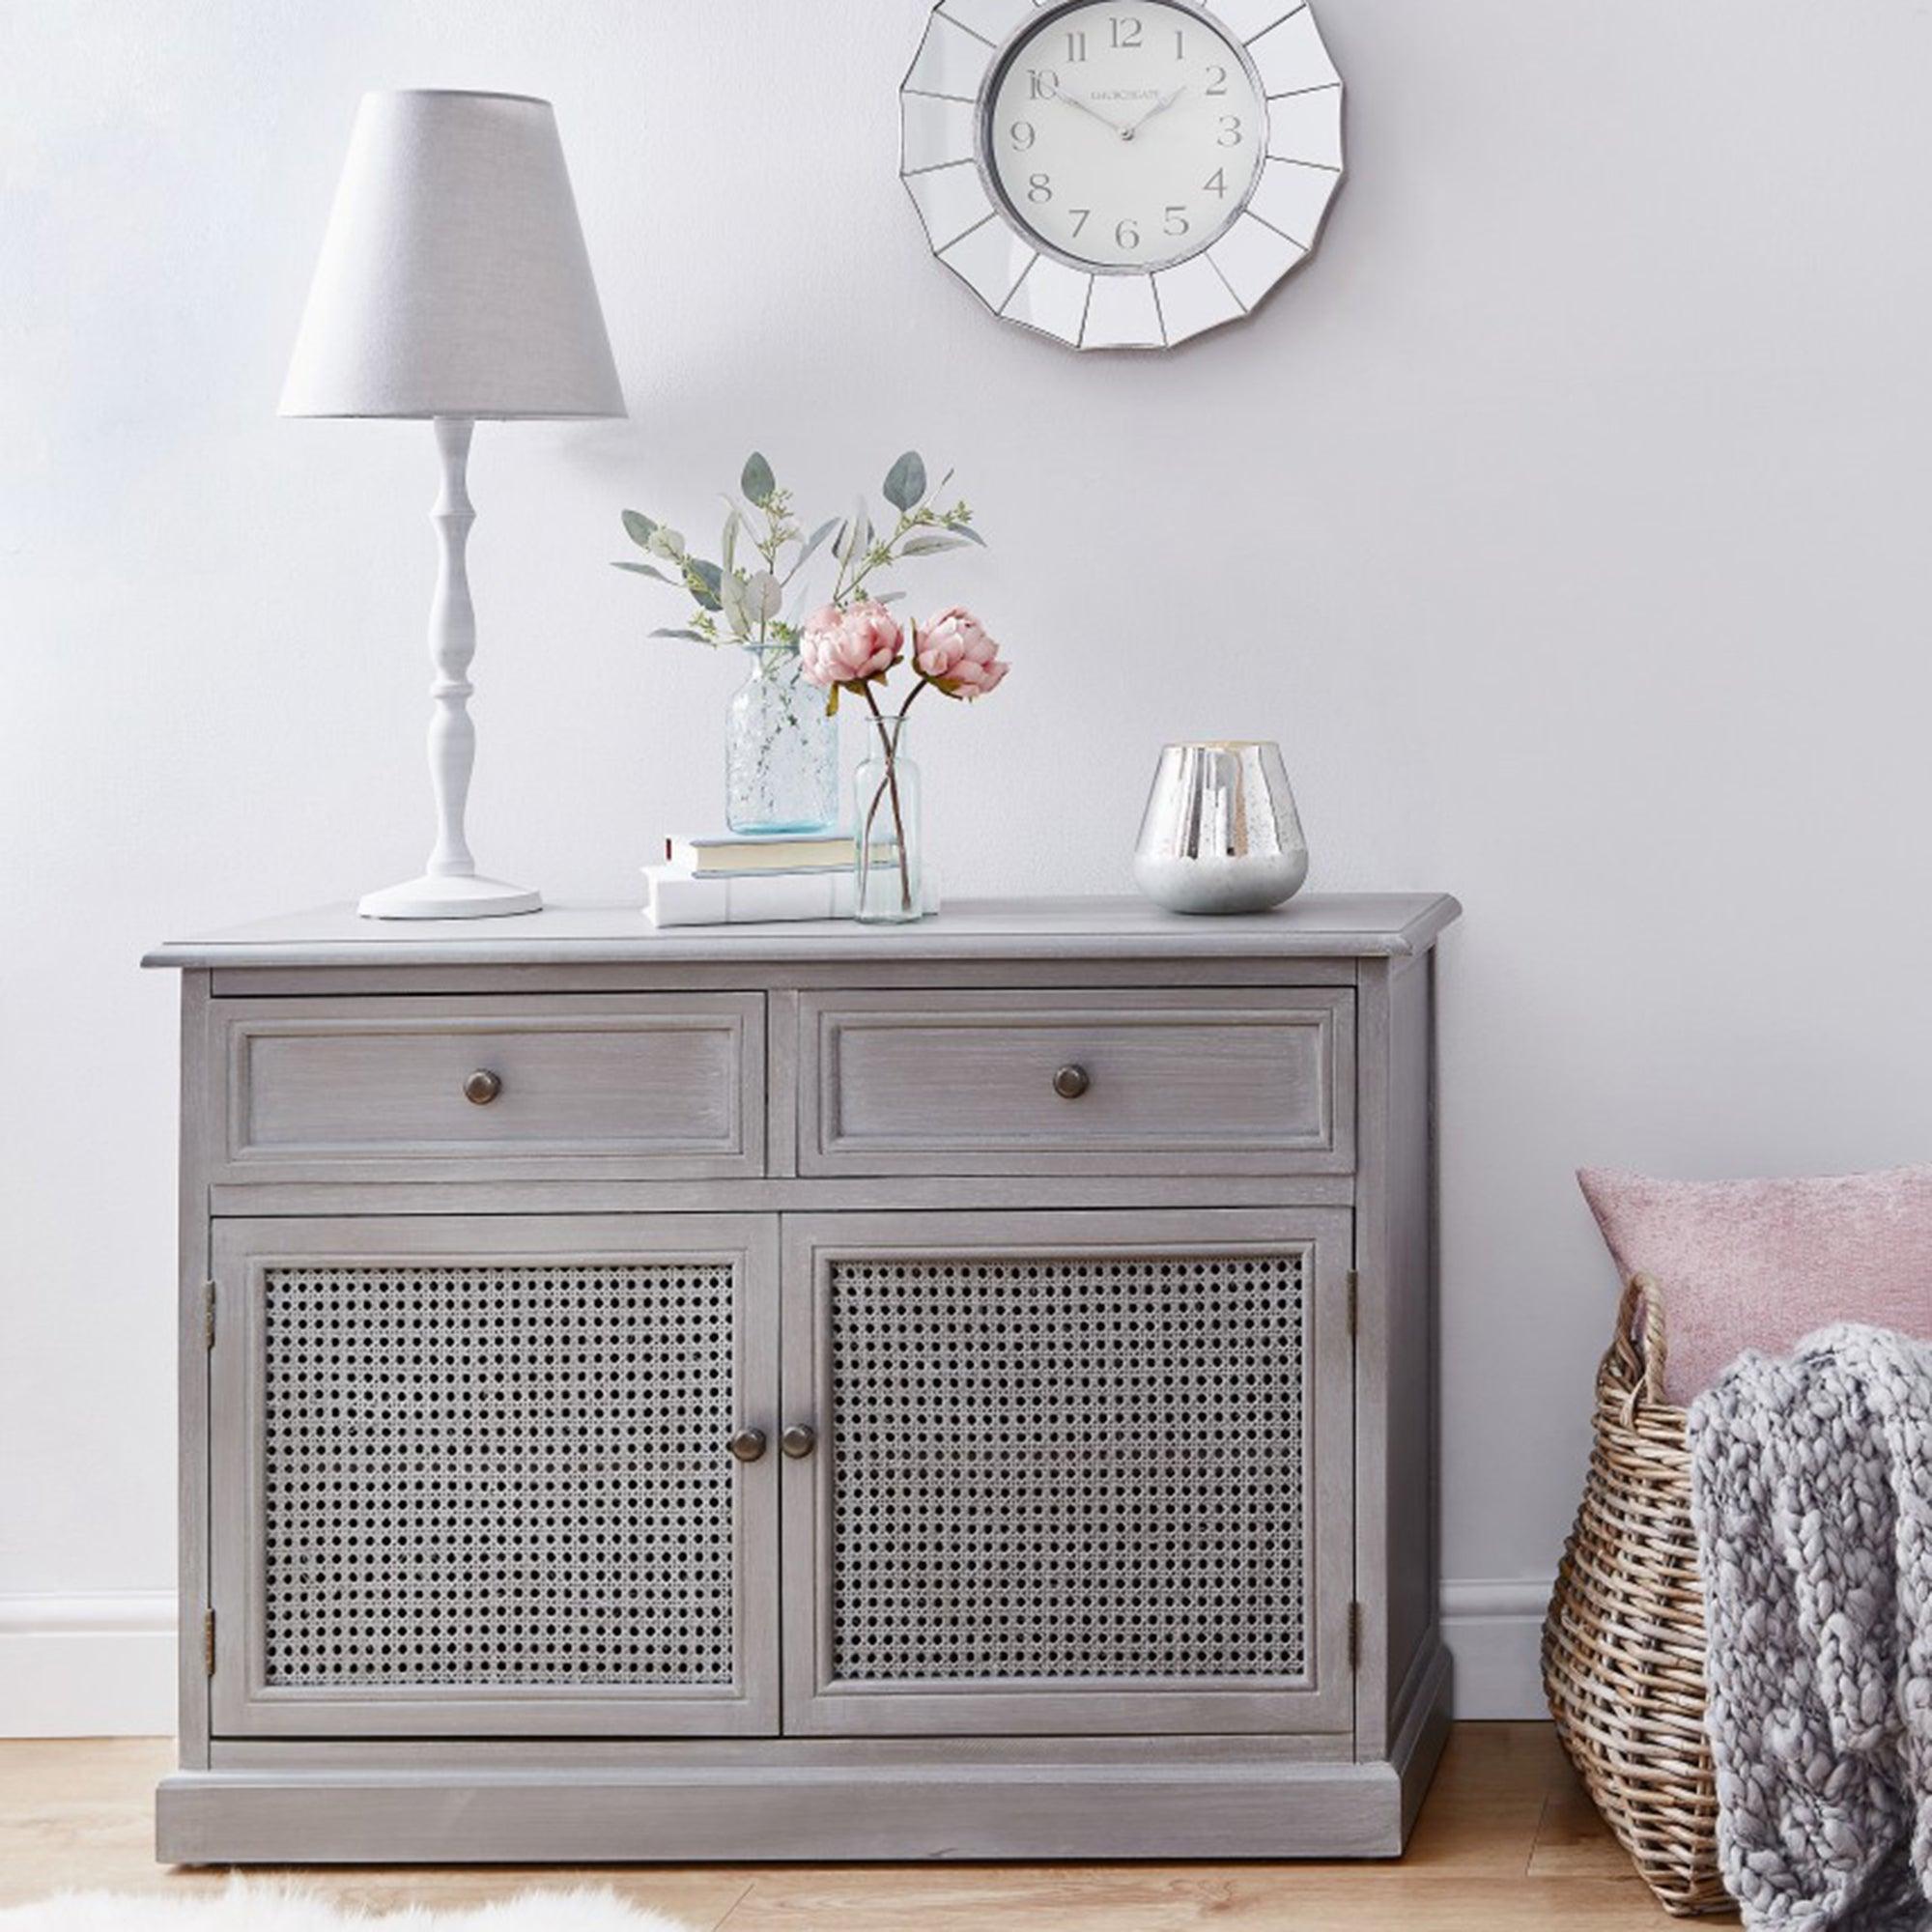 Lucy Cane Grey Small Sideboard Grey